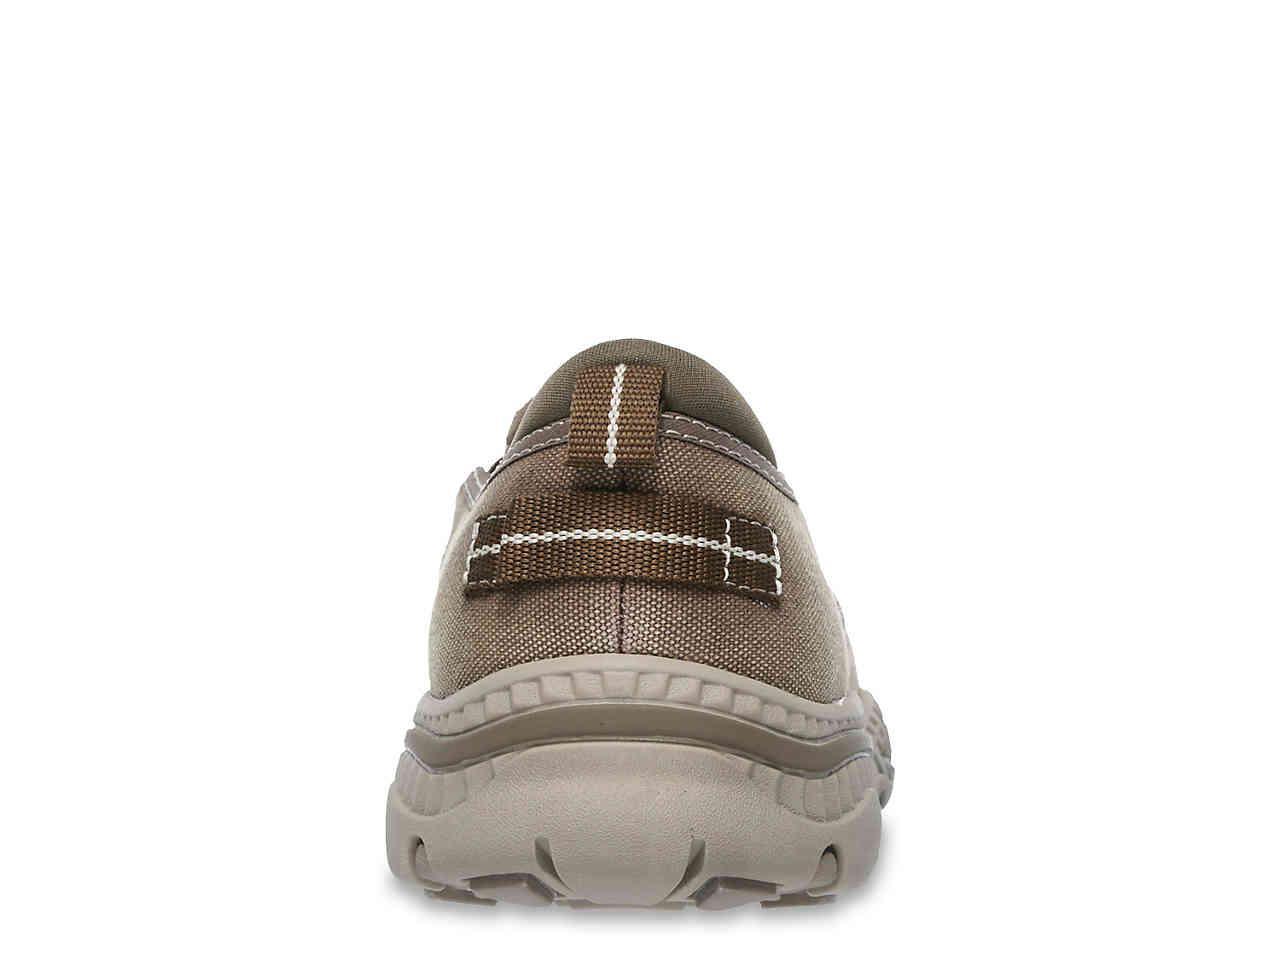 3bc748e3782 Skechers - Brown Relaxed Fit Creston Relect Slip-on for Men - Lyst. View  fullscreen